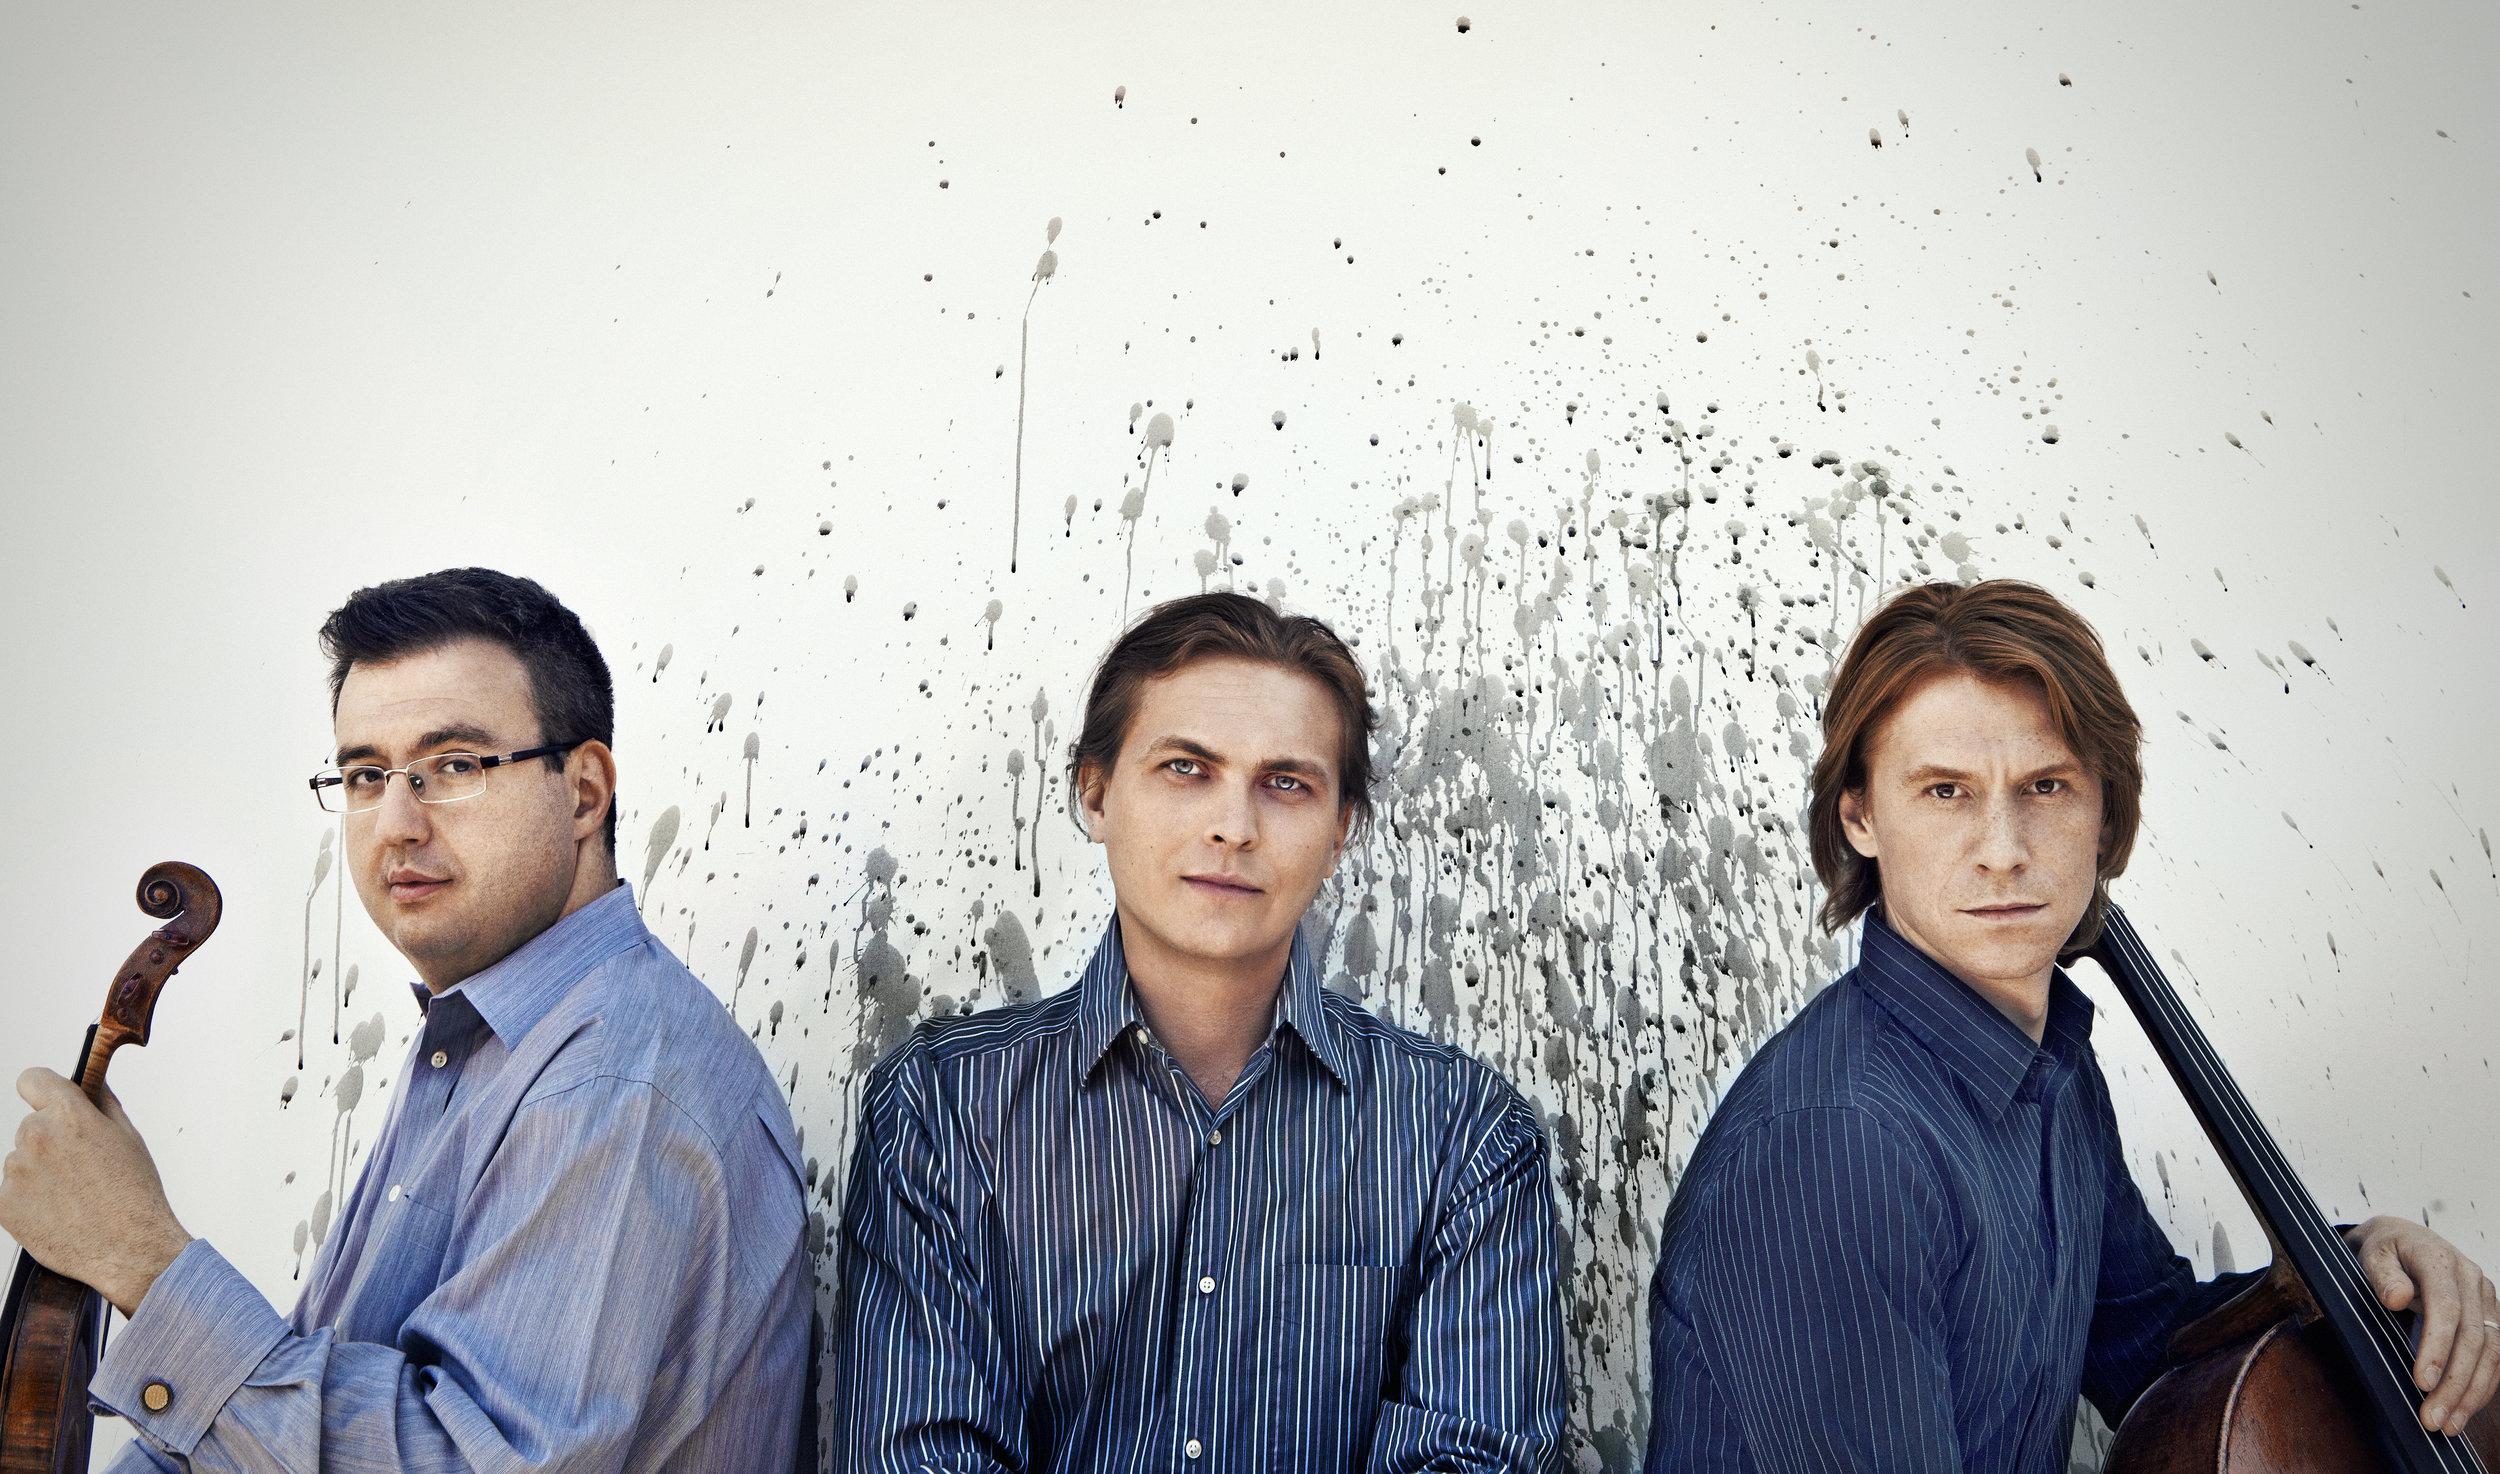 Hermitage Trio 3_credit Lisa-Marie Mazzuco.jpg